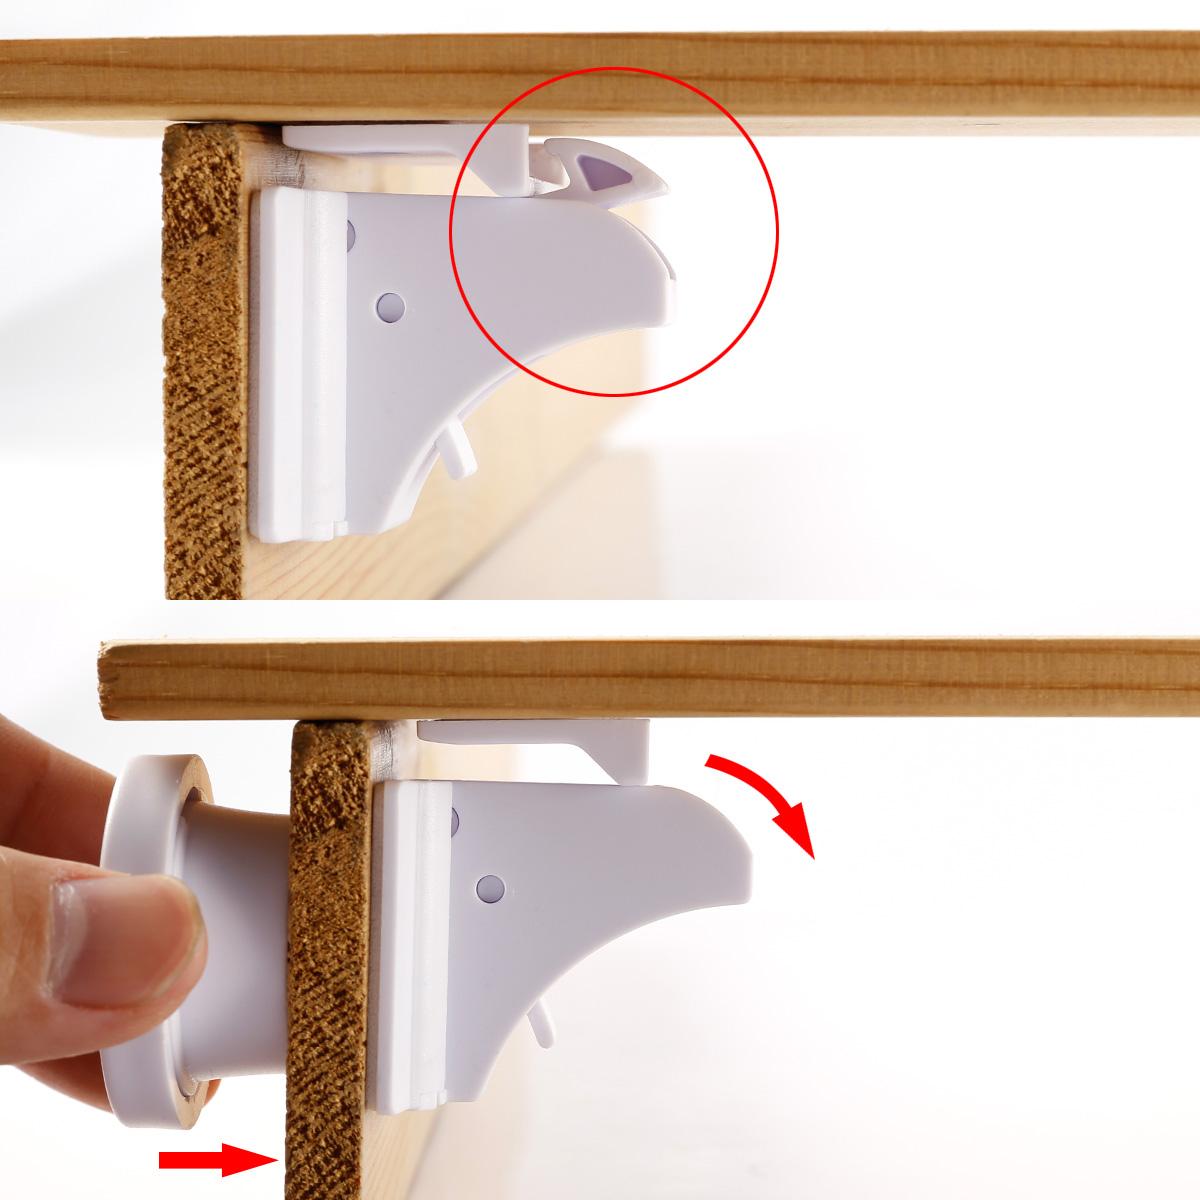 16x Baby Child Kids Pet Proof Cupboard Door Drawer Safety